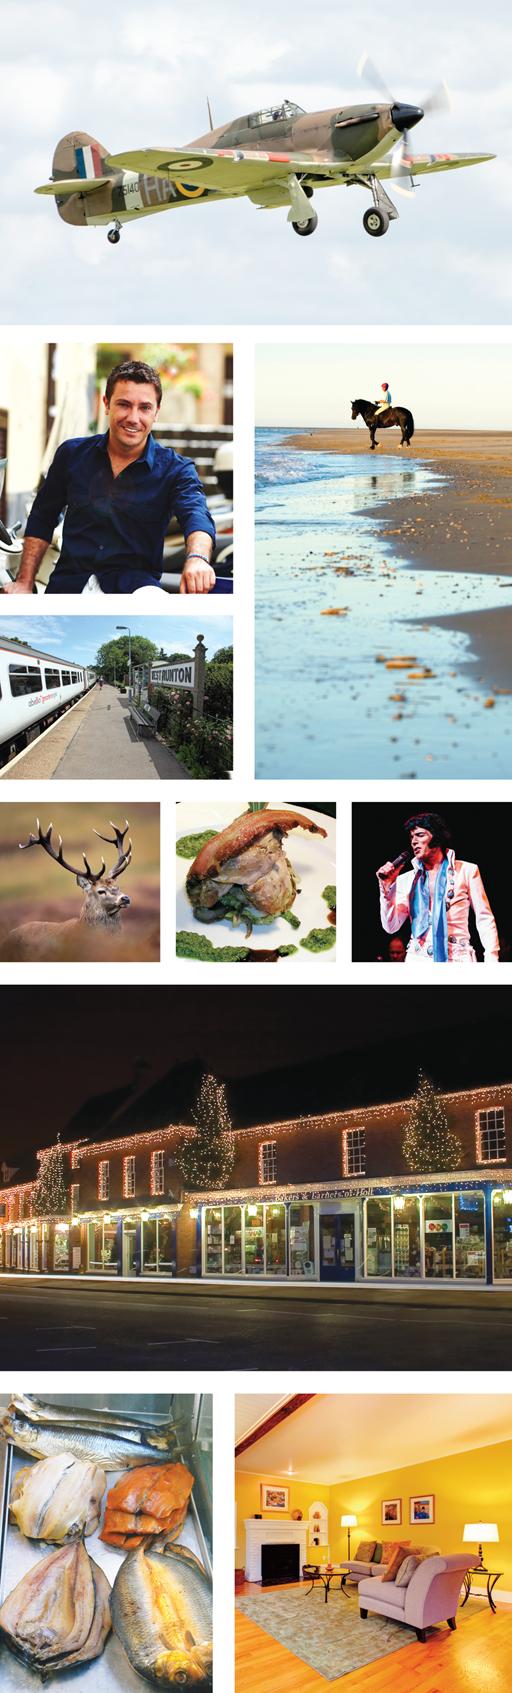 Suffolk Norfolk Life Magazine November 2015 - Holt, Danny Kerry, Ed Sheeran, Gino D'Acampo, Christmas, Home Lighting tiles